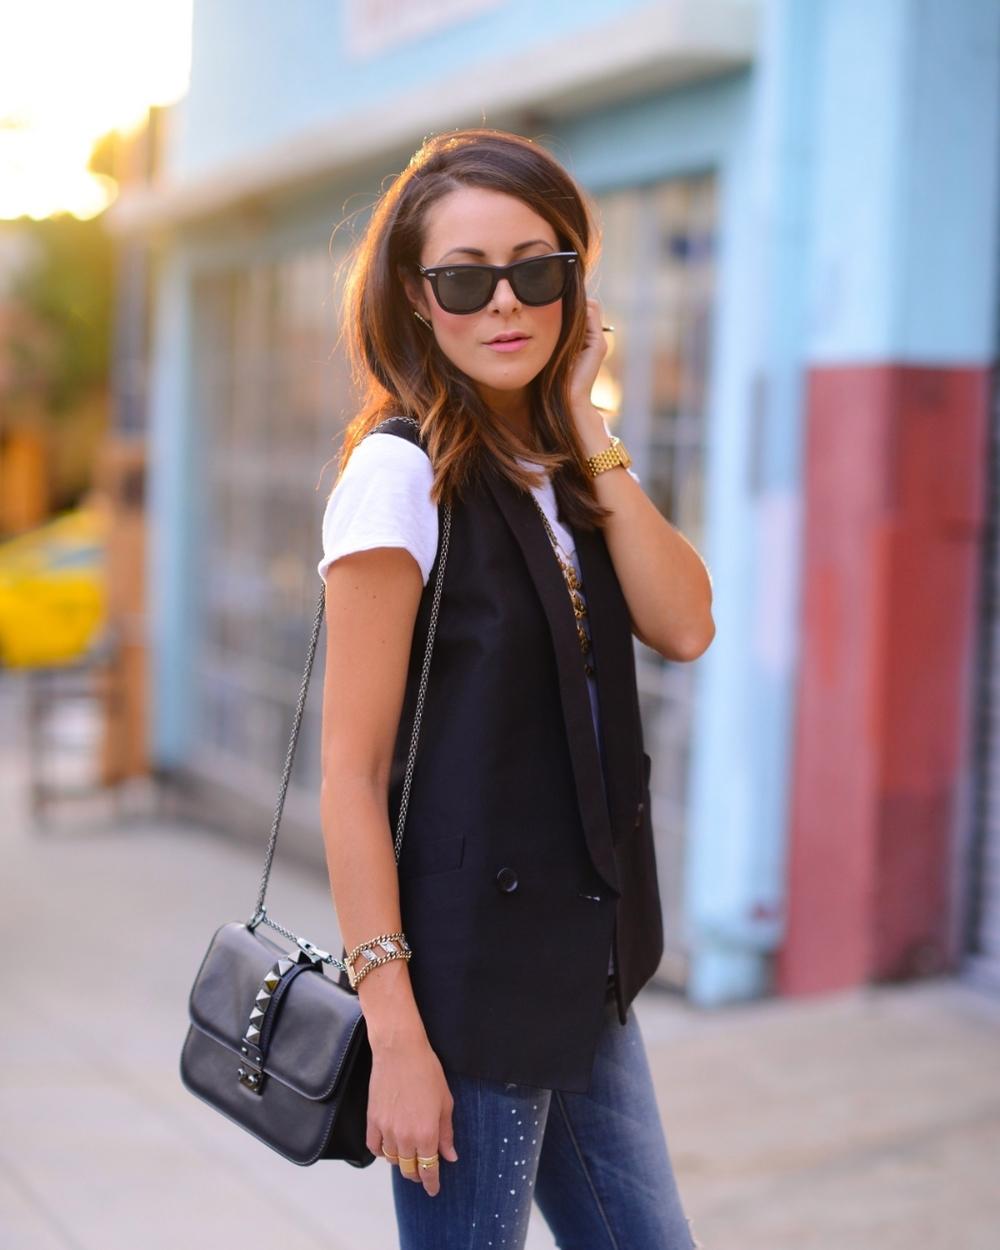 Aquazzura_Fashion_Streetstyle_BCBG_Valentino_SanDiego_LucysWhims_BananaRepublic.jpg